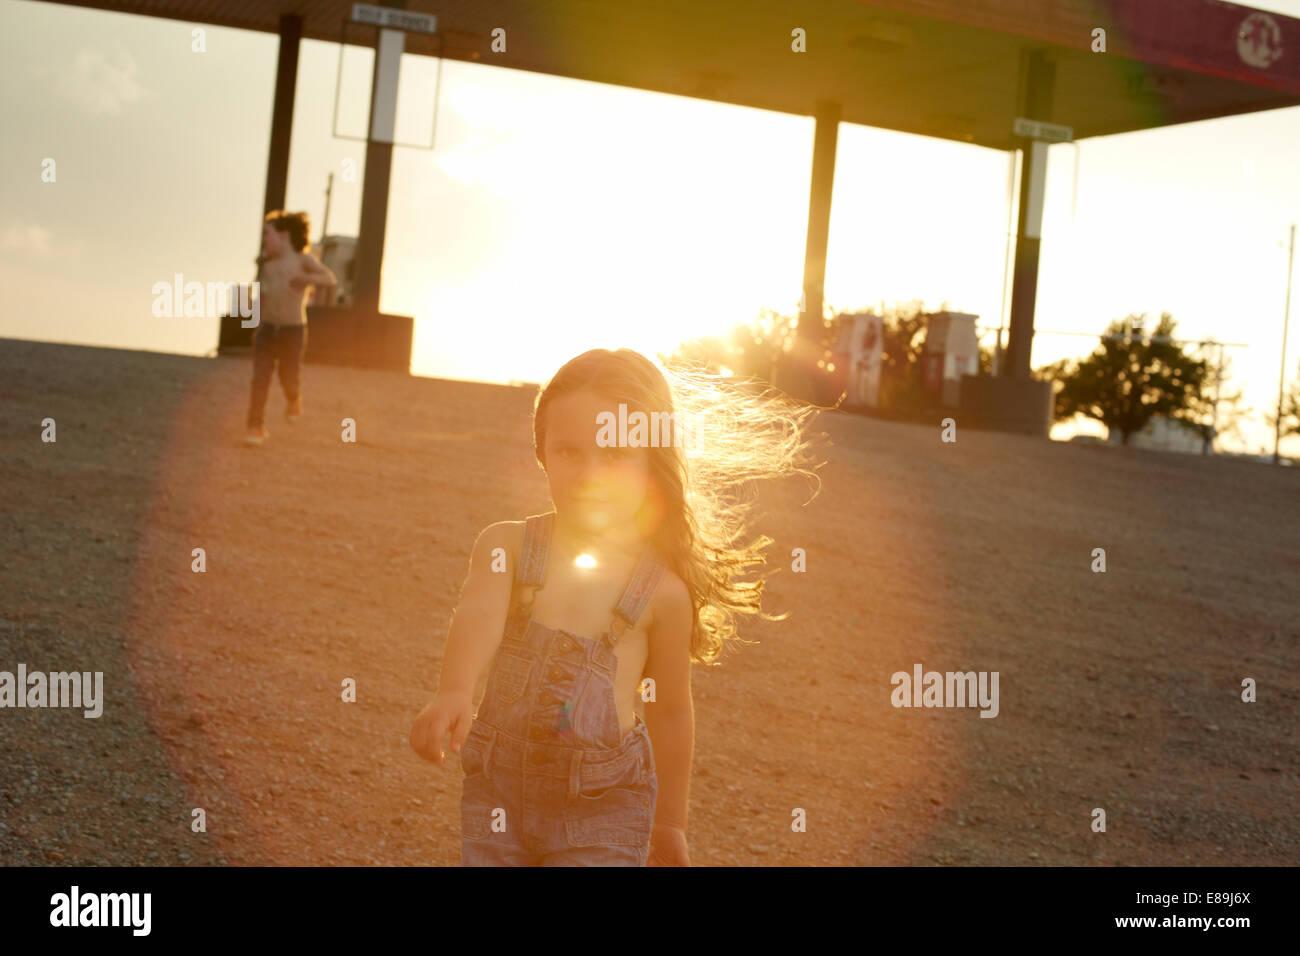 Kinder in der Tankstelle bei Sonnenuntergang Stockfoto